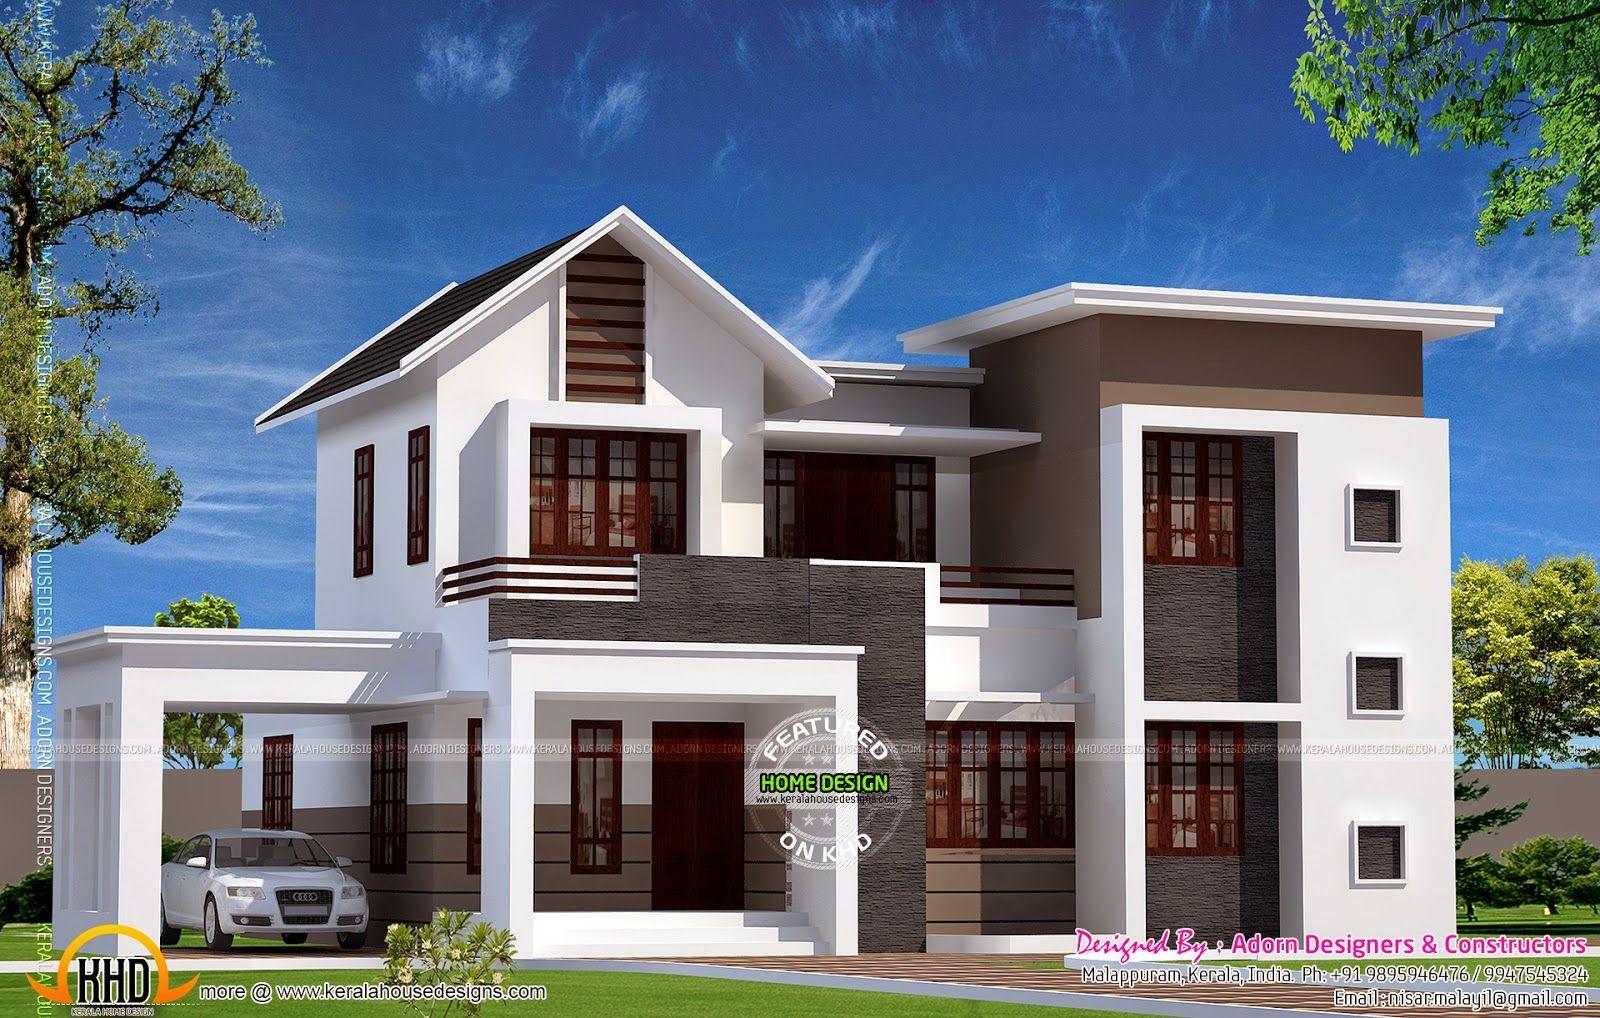 September 2014 Kerala Home Design And Floor Plans Kerala House Design House Outside Design 2 Storey House Design